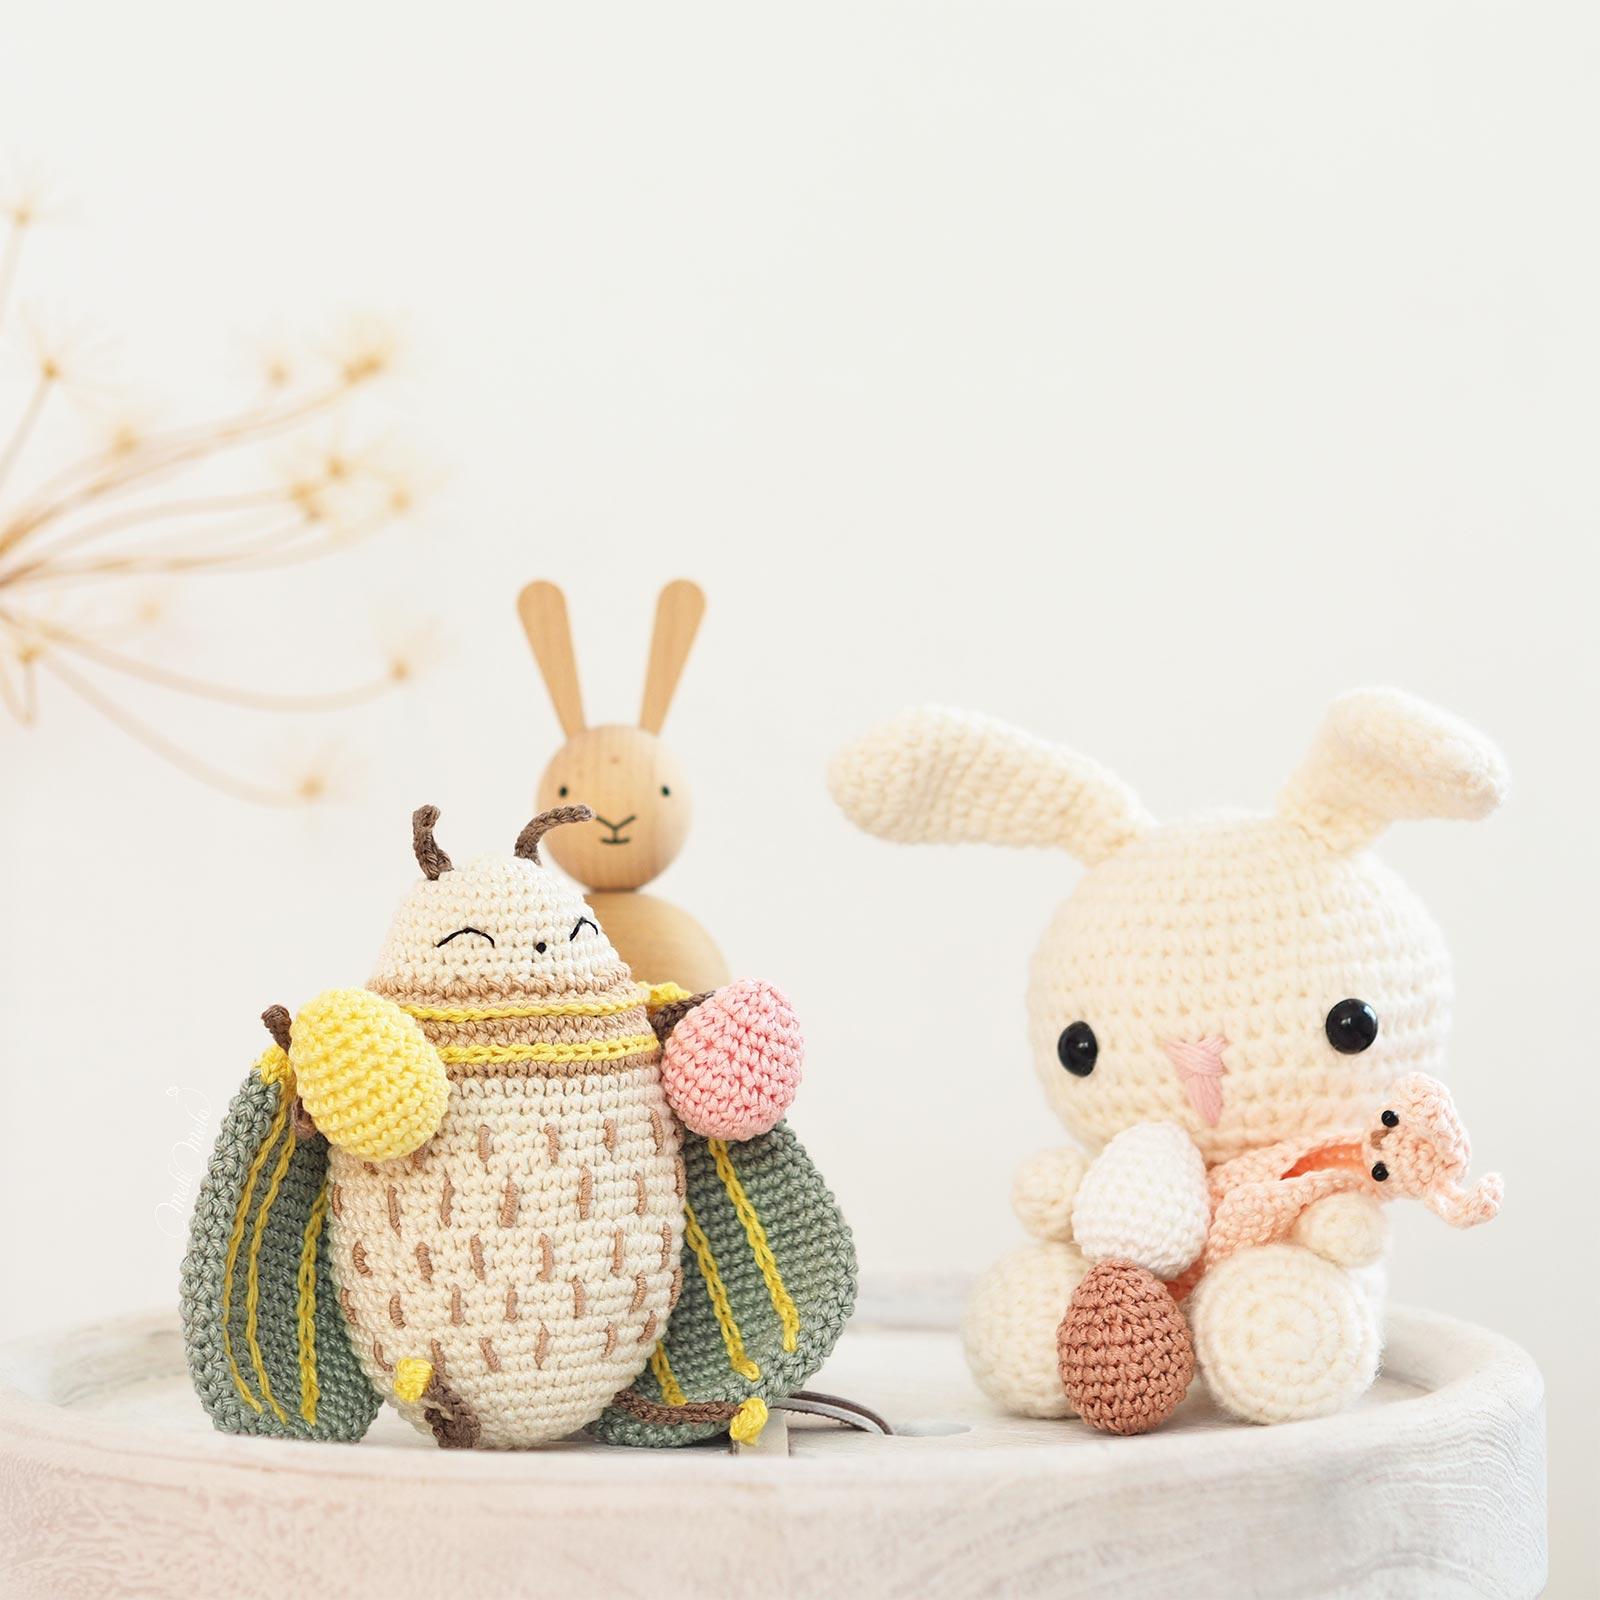 amigurumi-crochet-hubertus-scarabee-lapin-alligator-potager-laboutiquedemelimelo